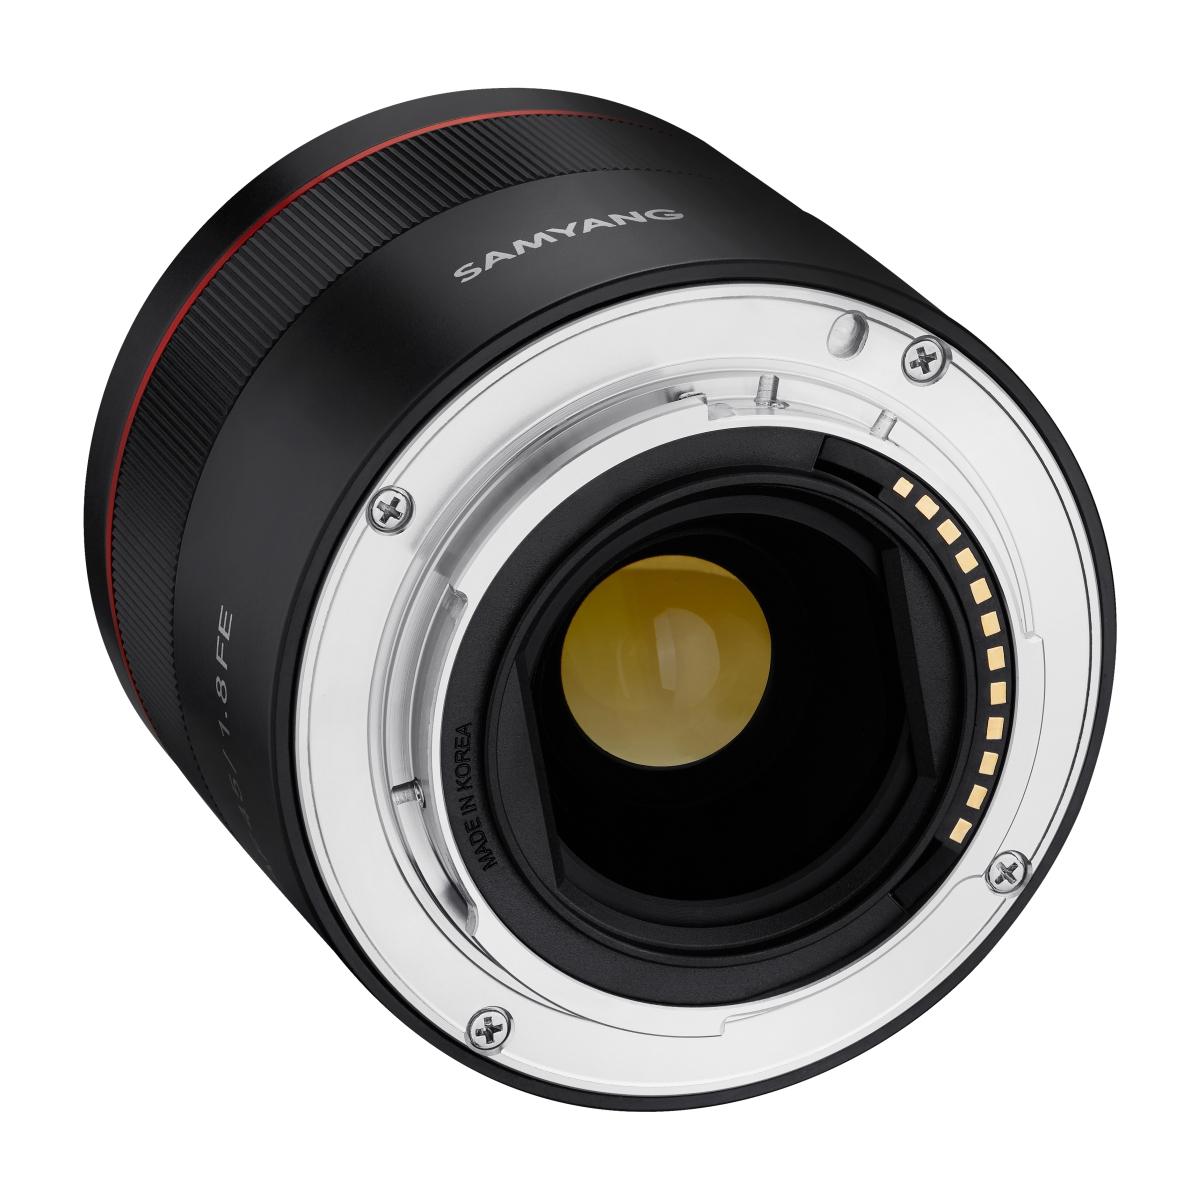 Samyang 45mm f1.8 Sony E-Mount